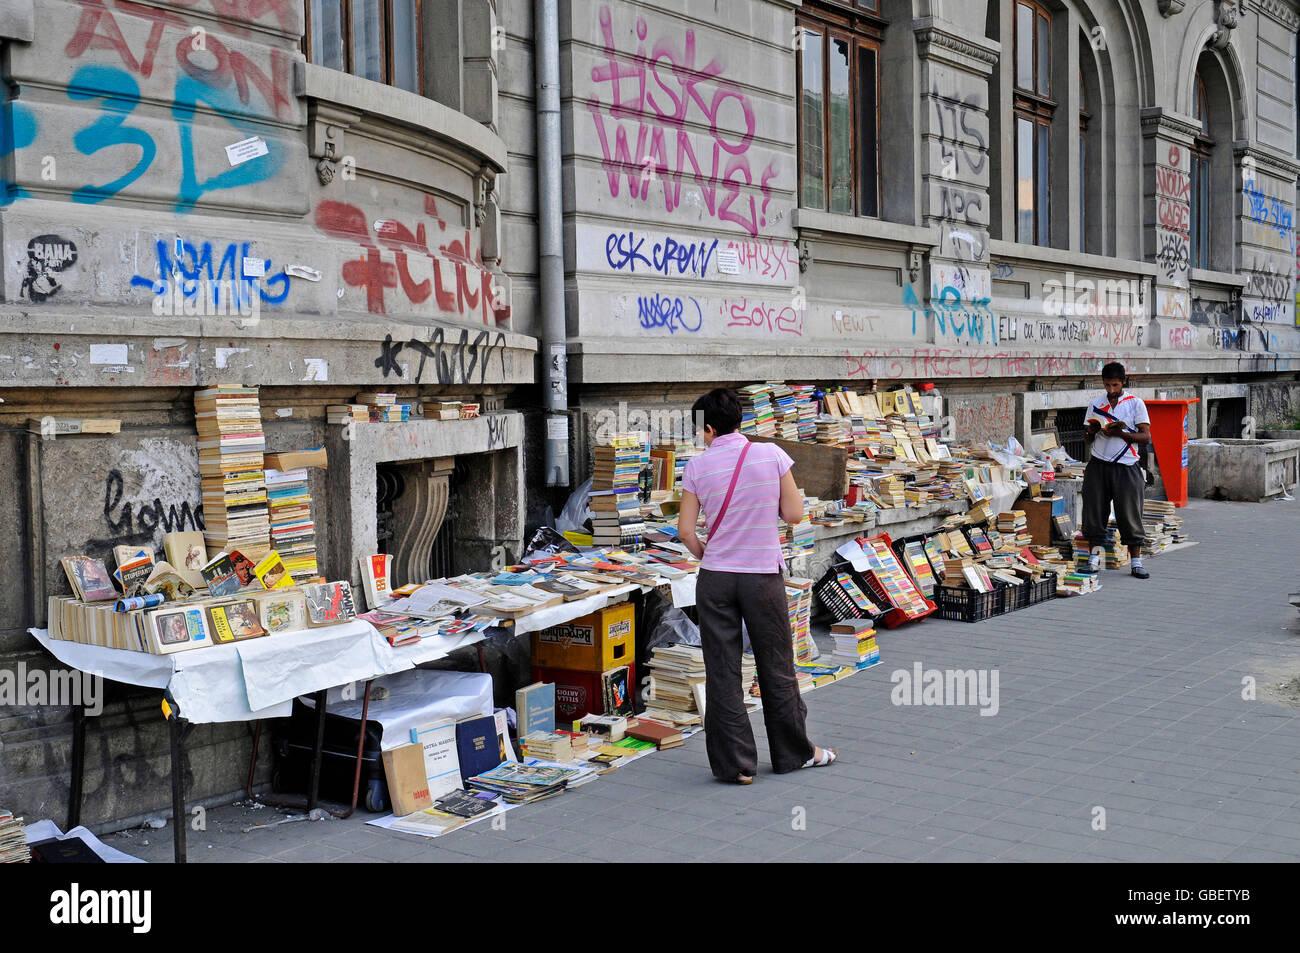 Book seller, university, Bucharest, Romania - Stock Image